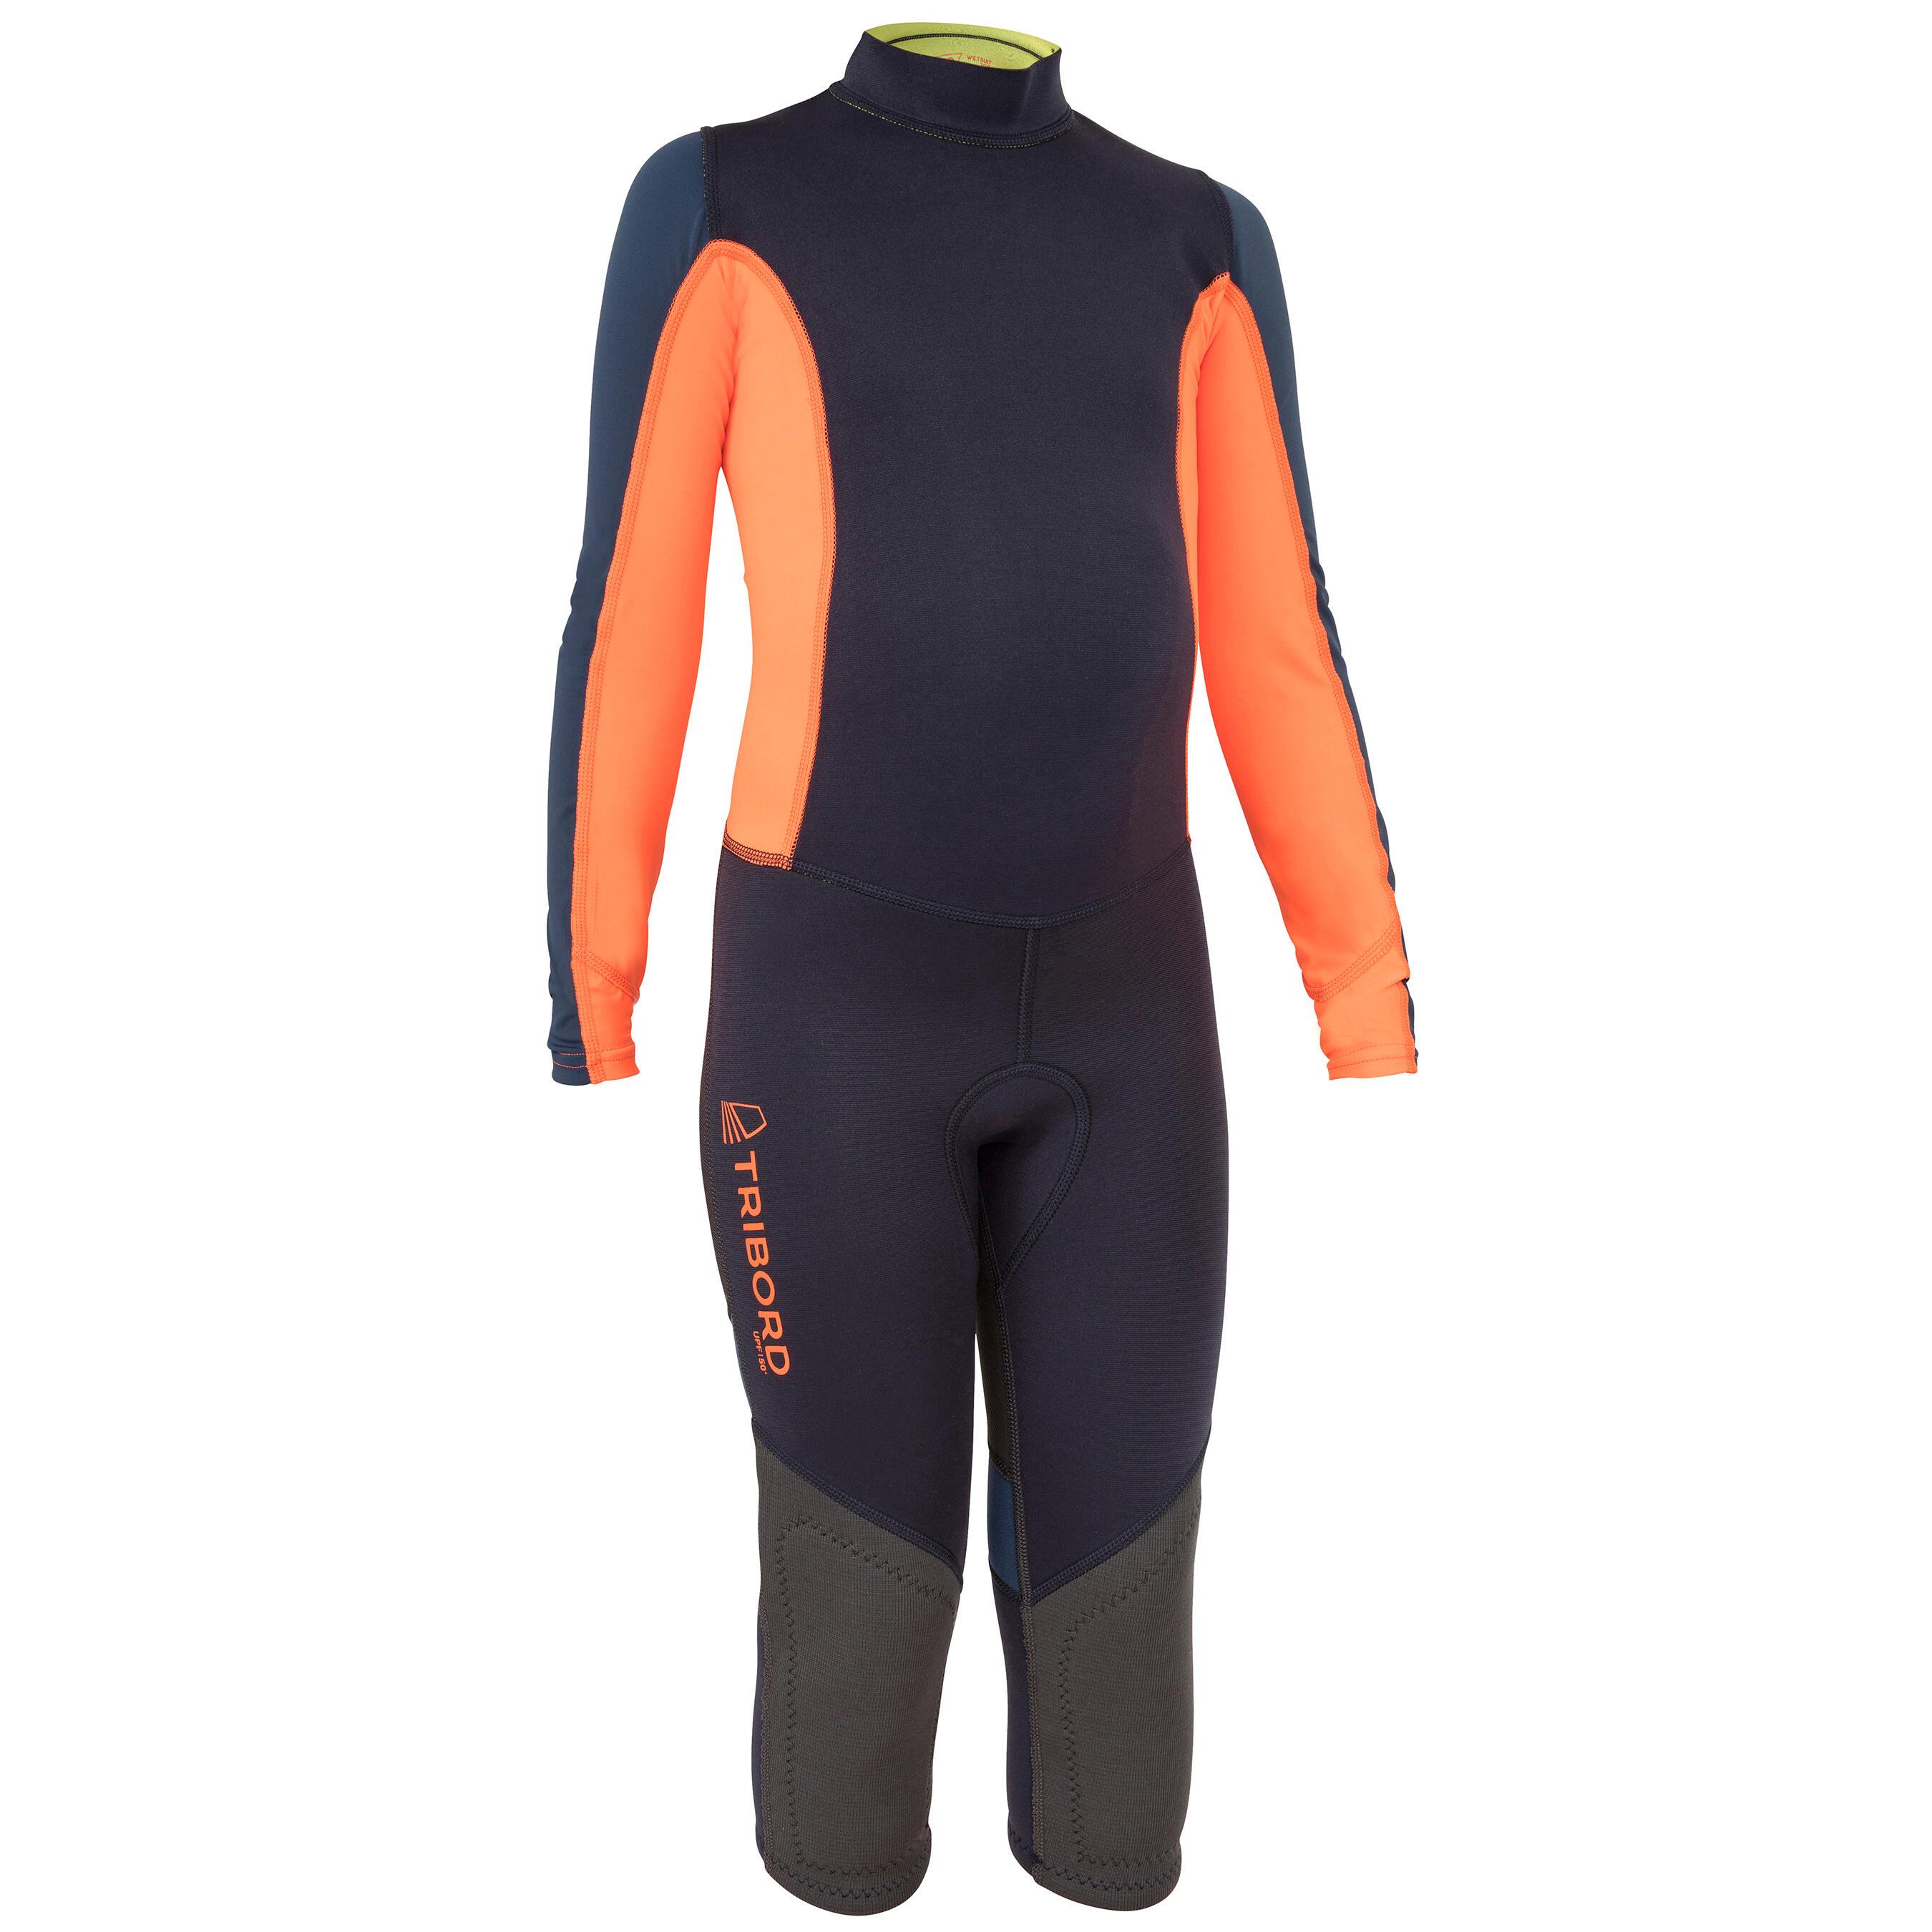 Tribord Uv-werende kinder wetsuit zwaardboot/catamaran neopreen 1 mm donkerblauw/oranje